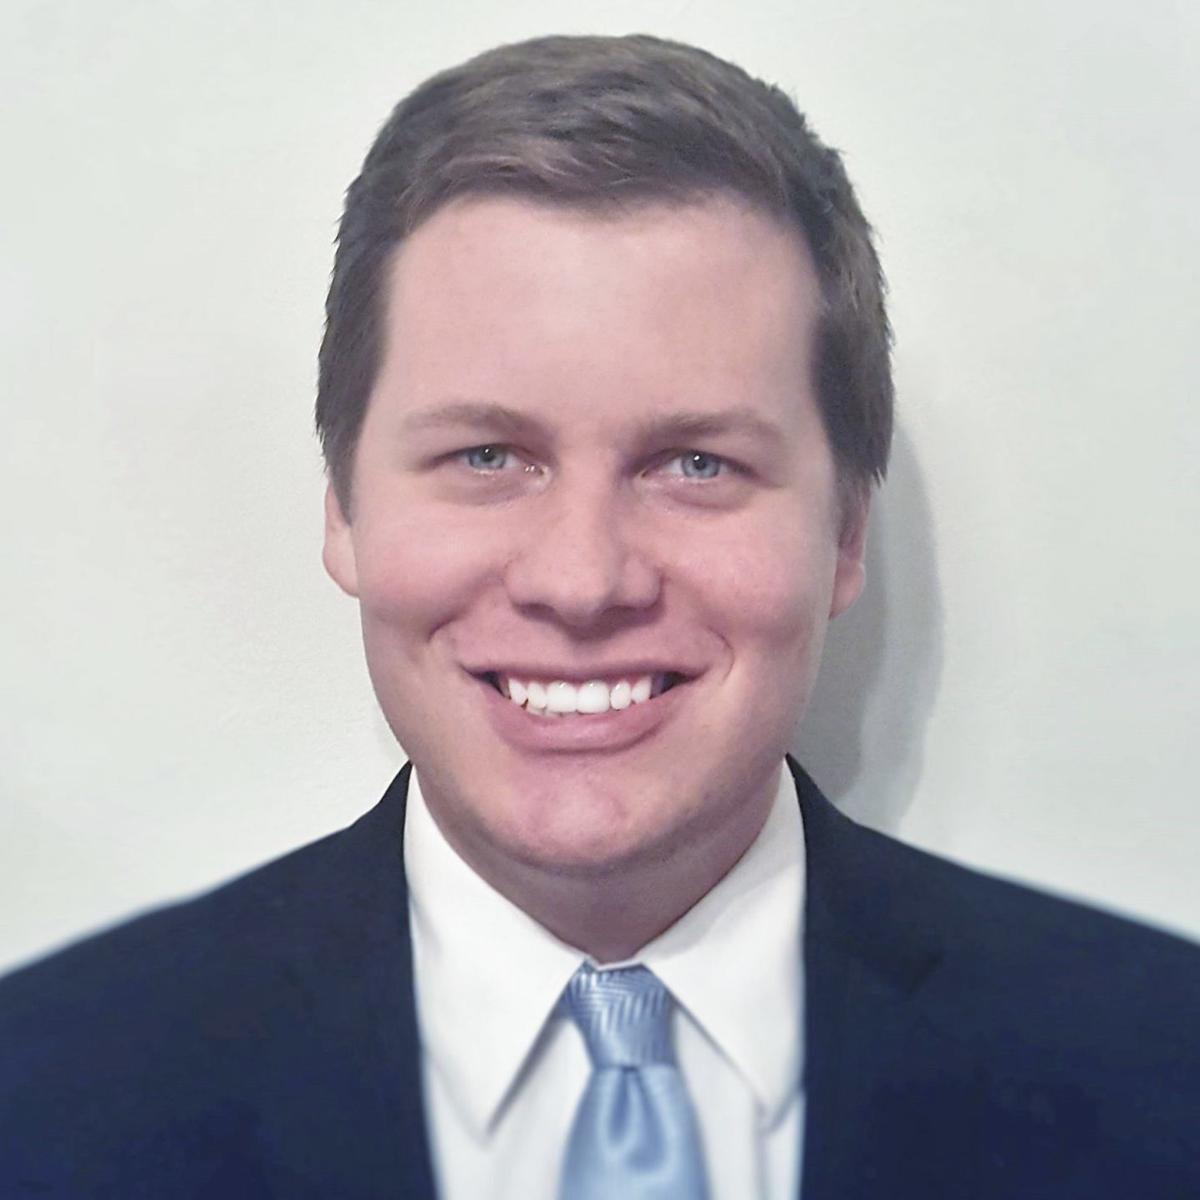 Sam Schultz, Mount Pleasant community development director